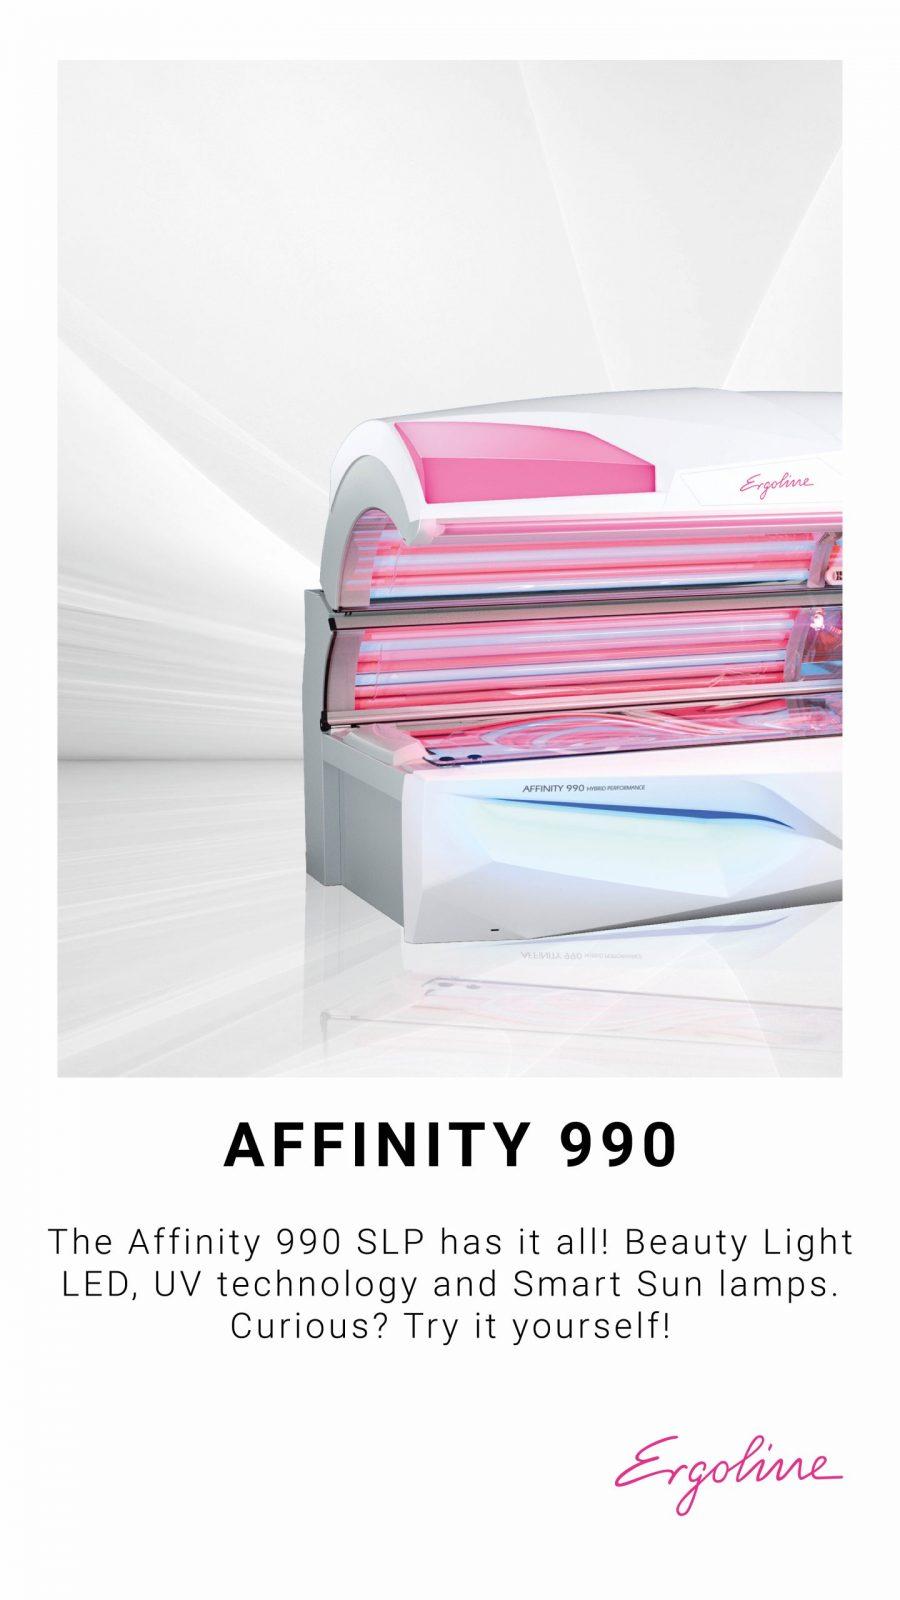 Affinity 990